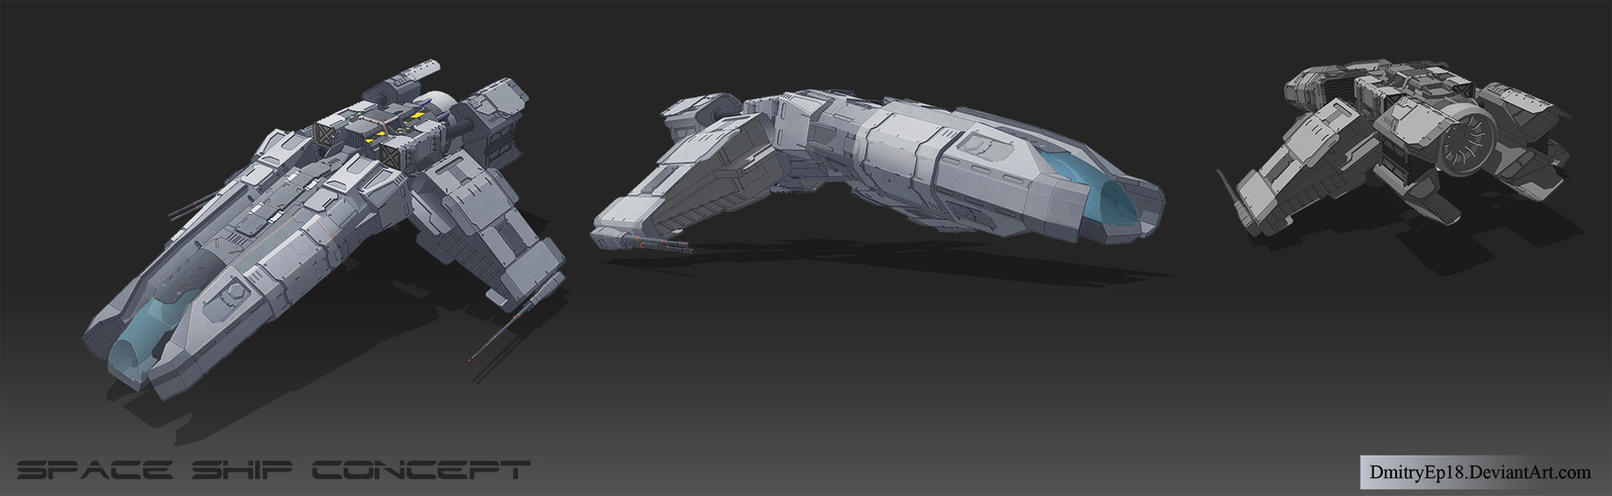 Space ship concept by DmitryEp18